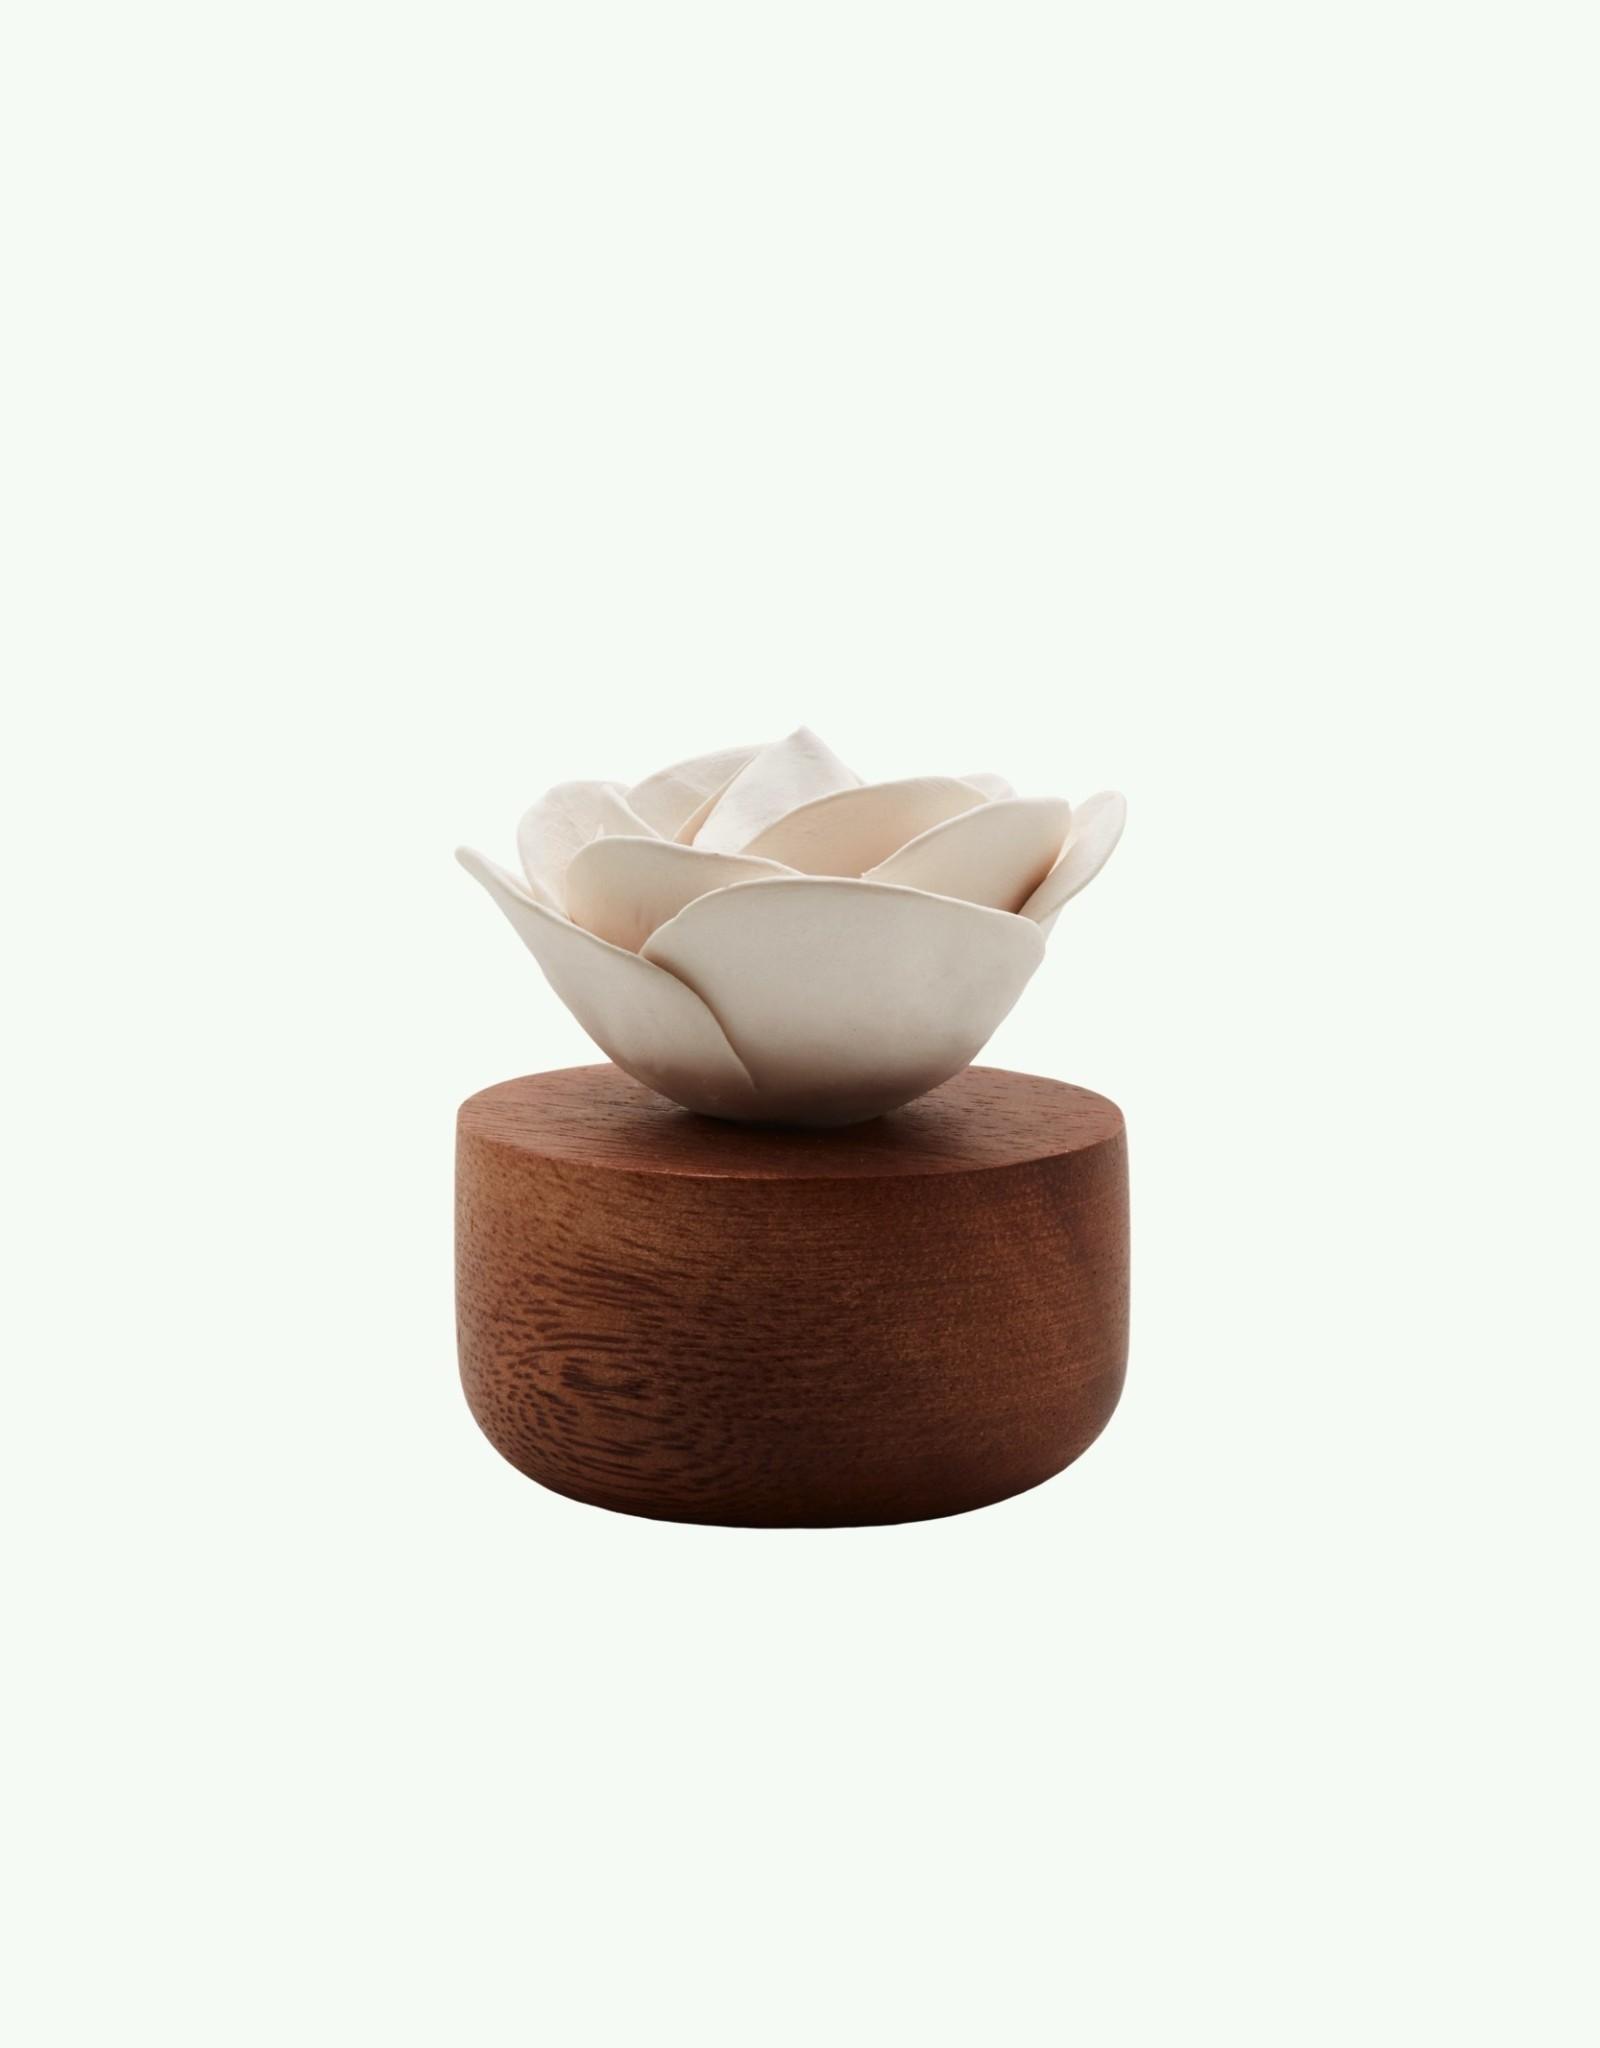 Anoq Anoq - Gardenia du Laos - Diffuseur de Parfum